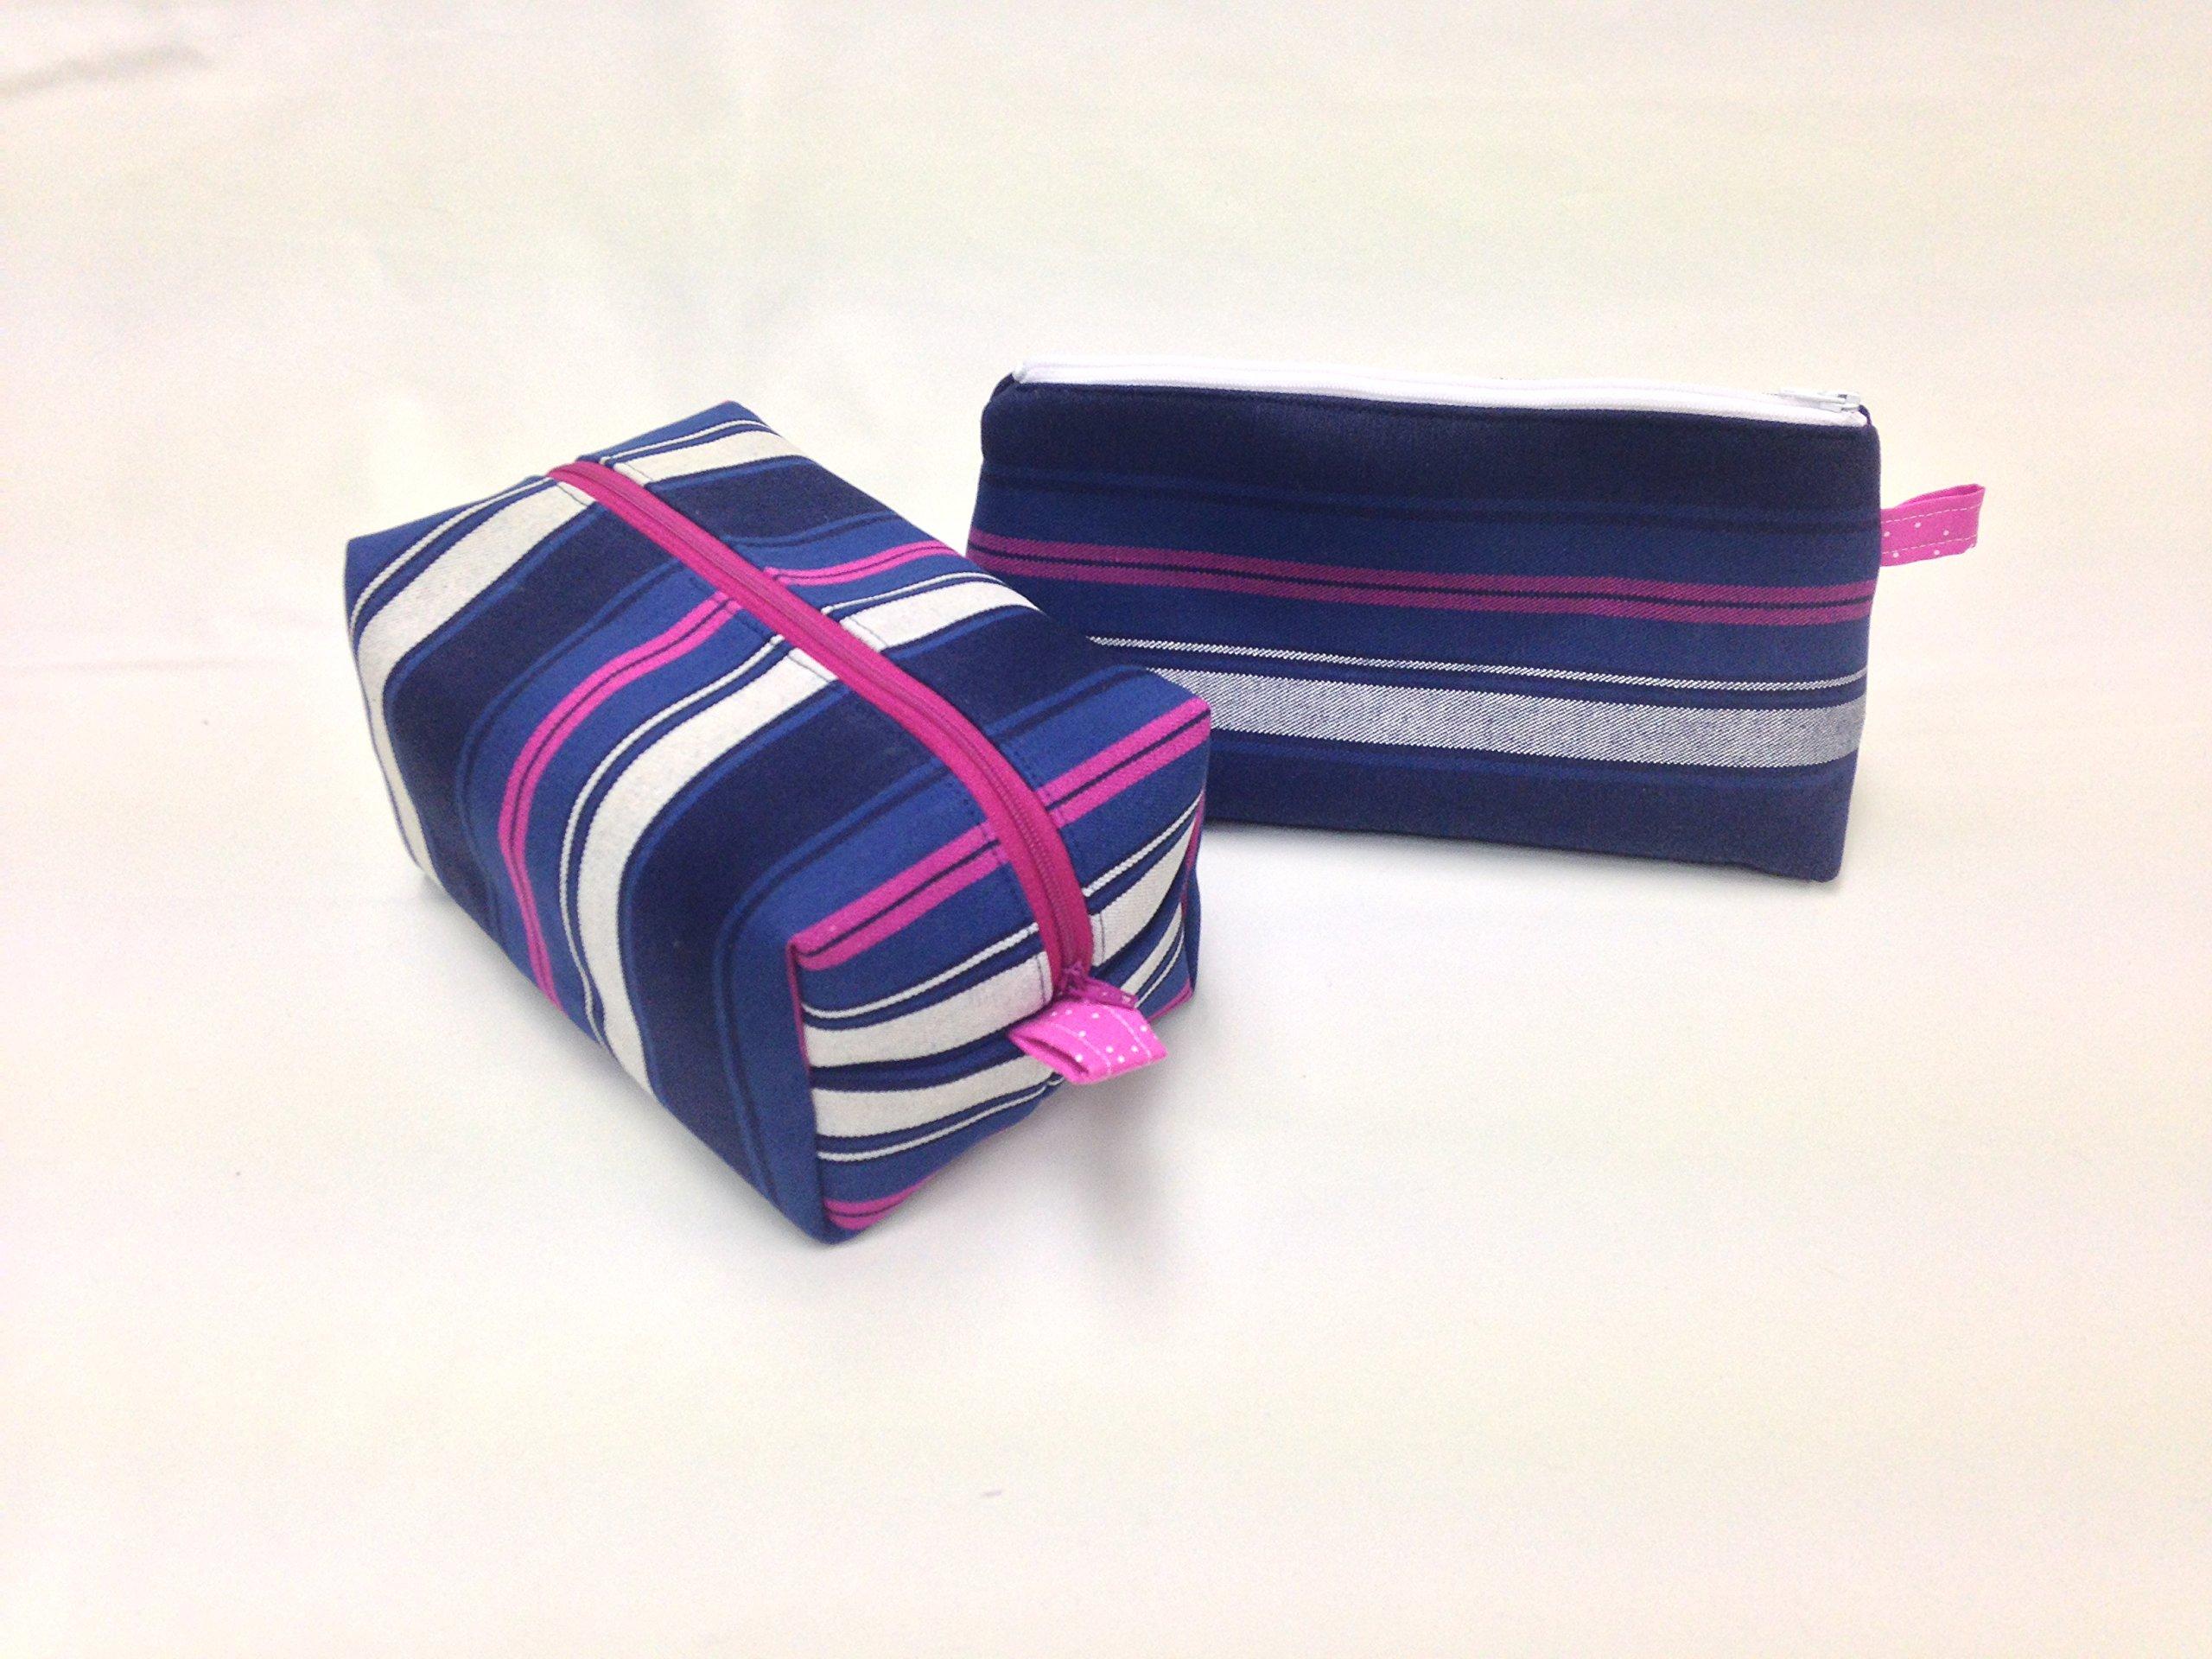 Denim Stripes Toiletry/Makeup Bag Set